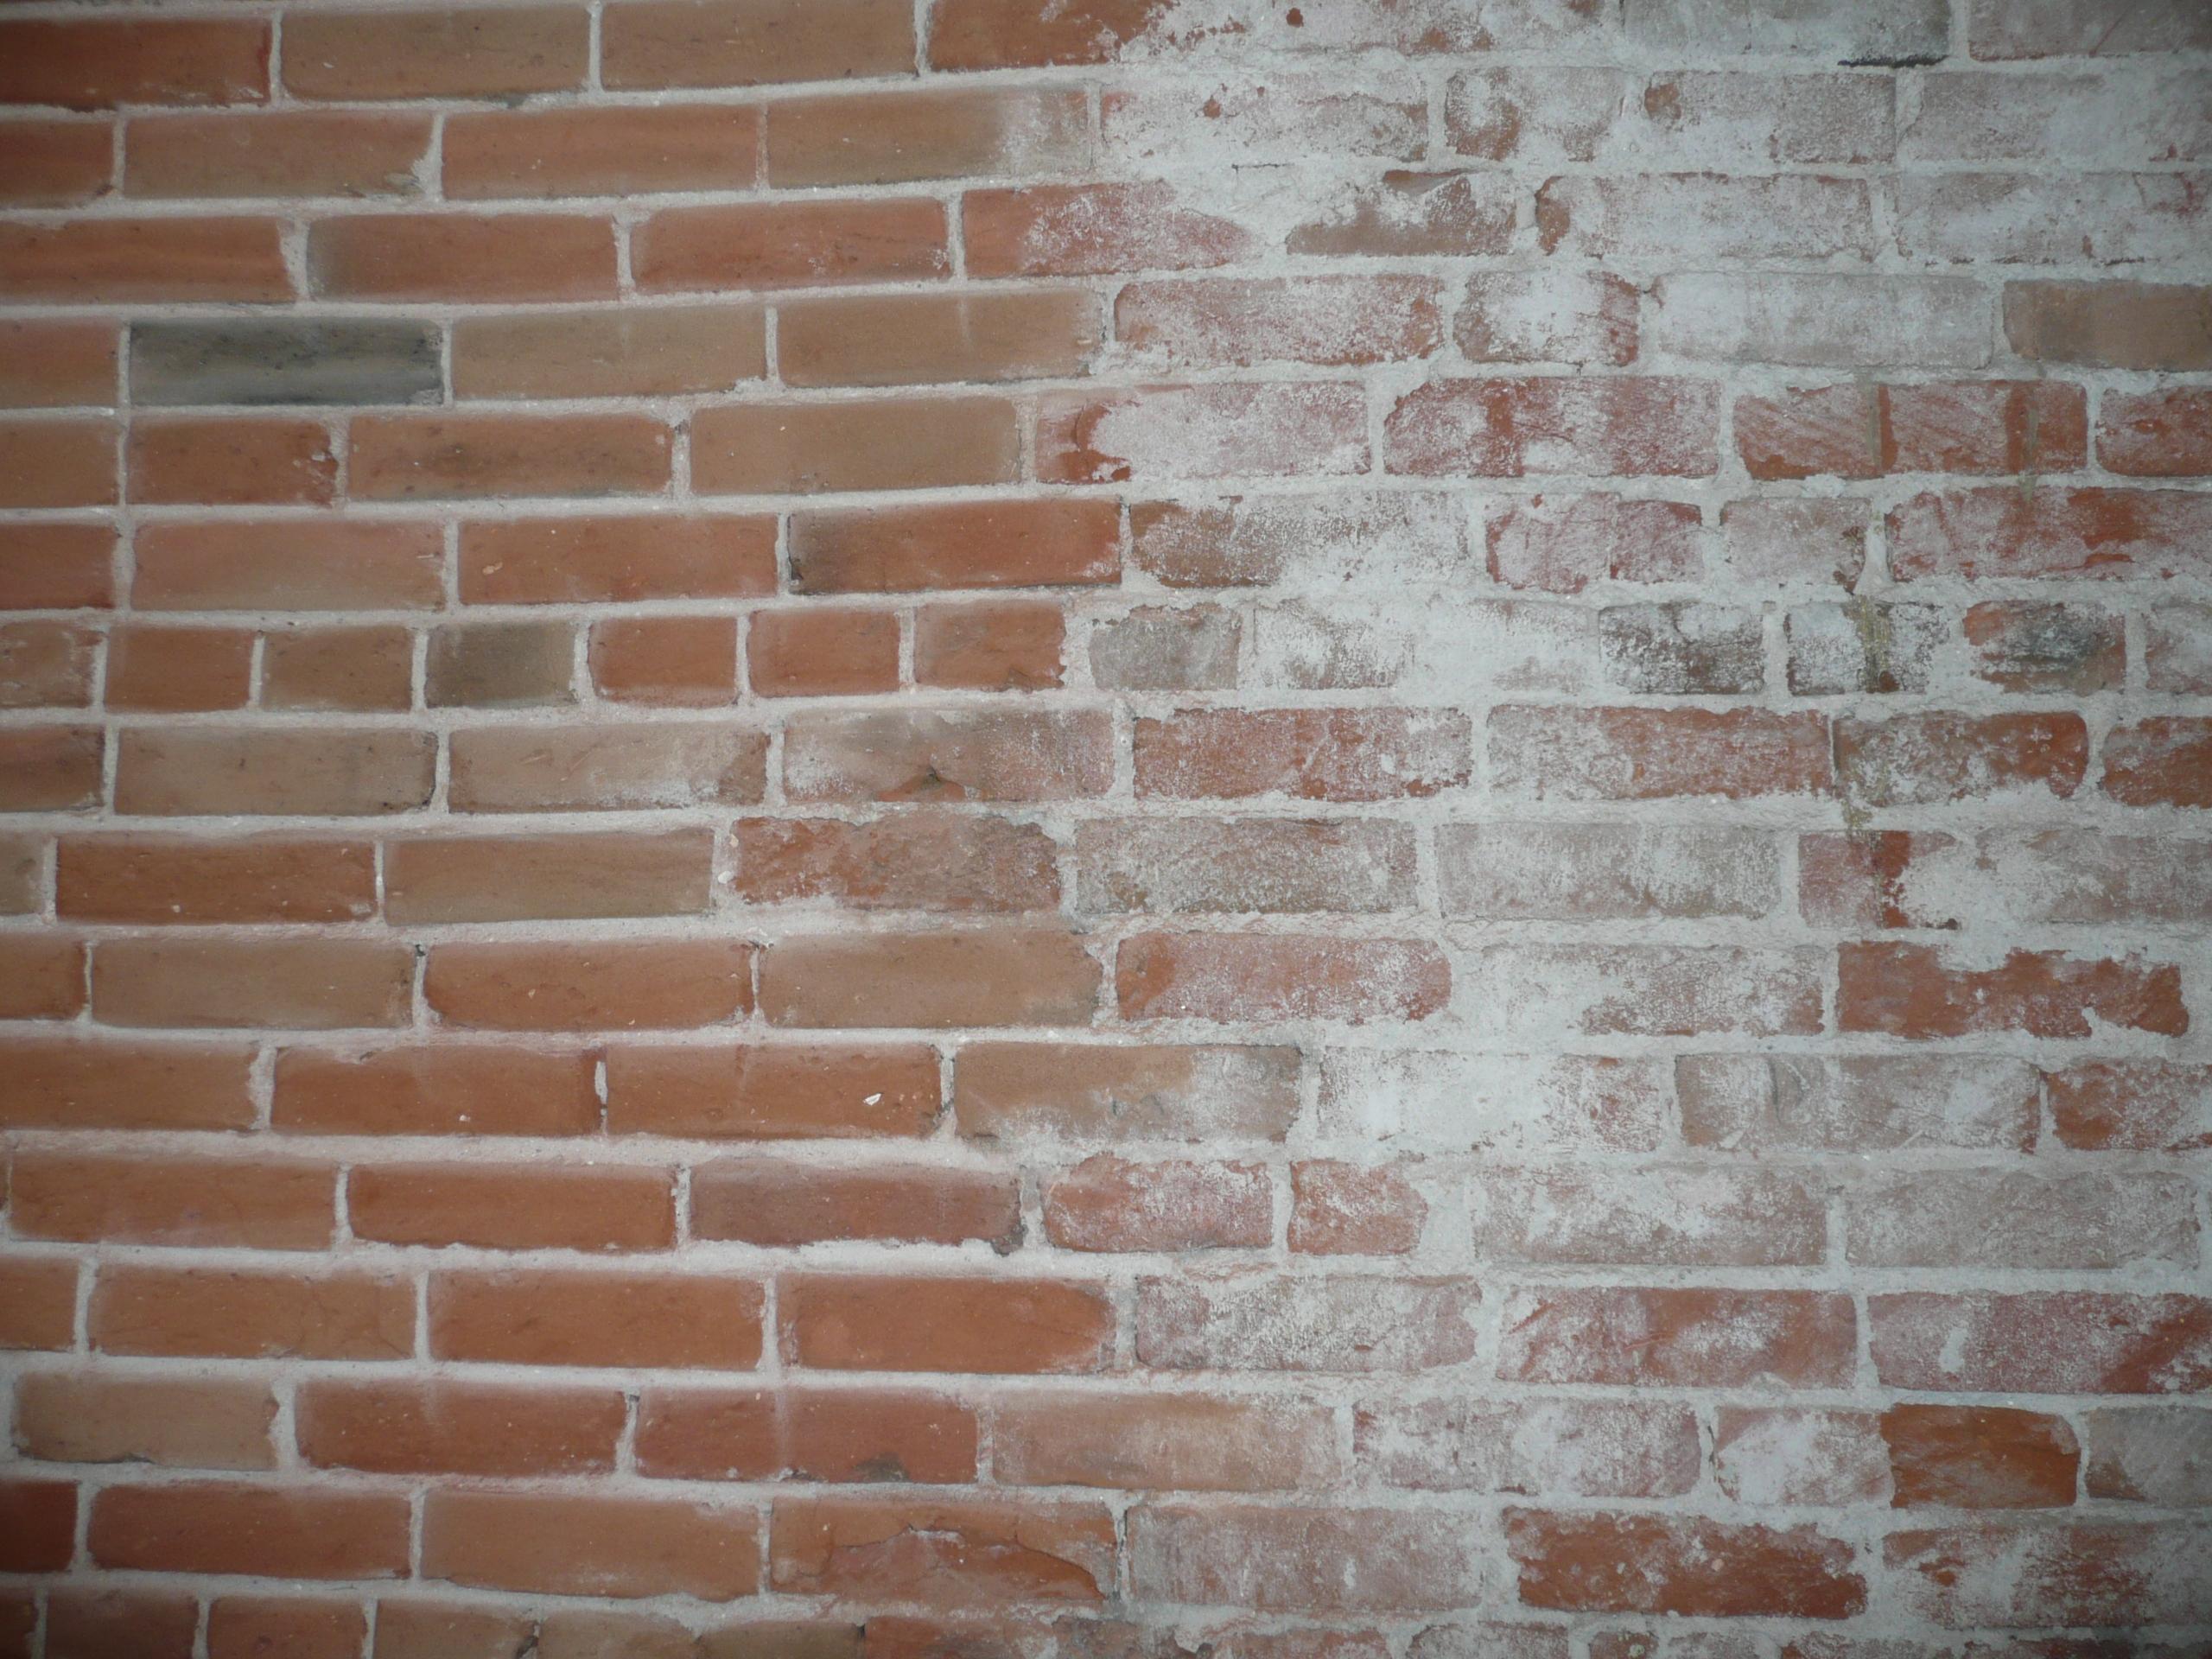 Brick Wallpaper Home Depot httpwwwpic2flycomBrickWallpaperLowe 2560x1920